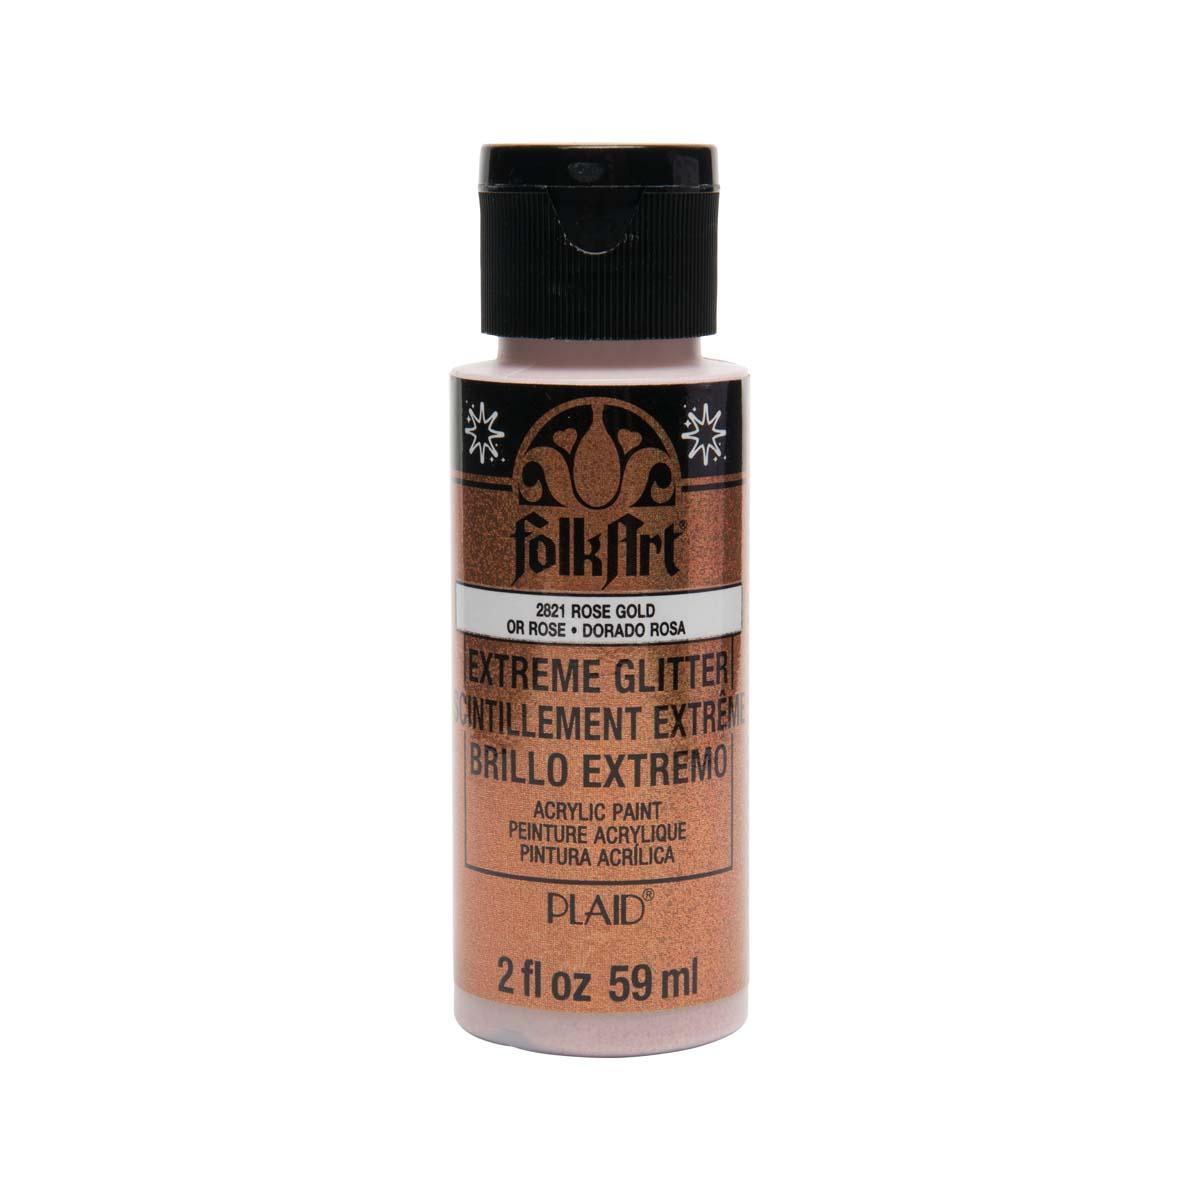 FolkArt ® Extreme Glitter™ - Rose Gold, 2 oz.